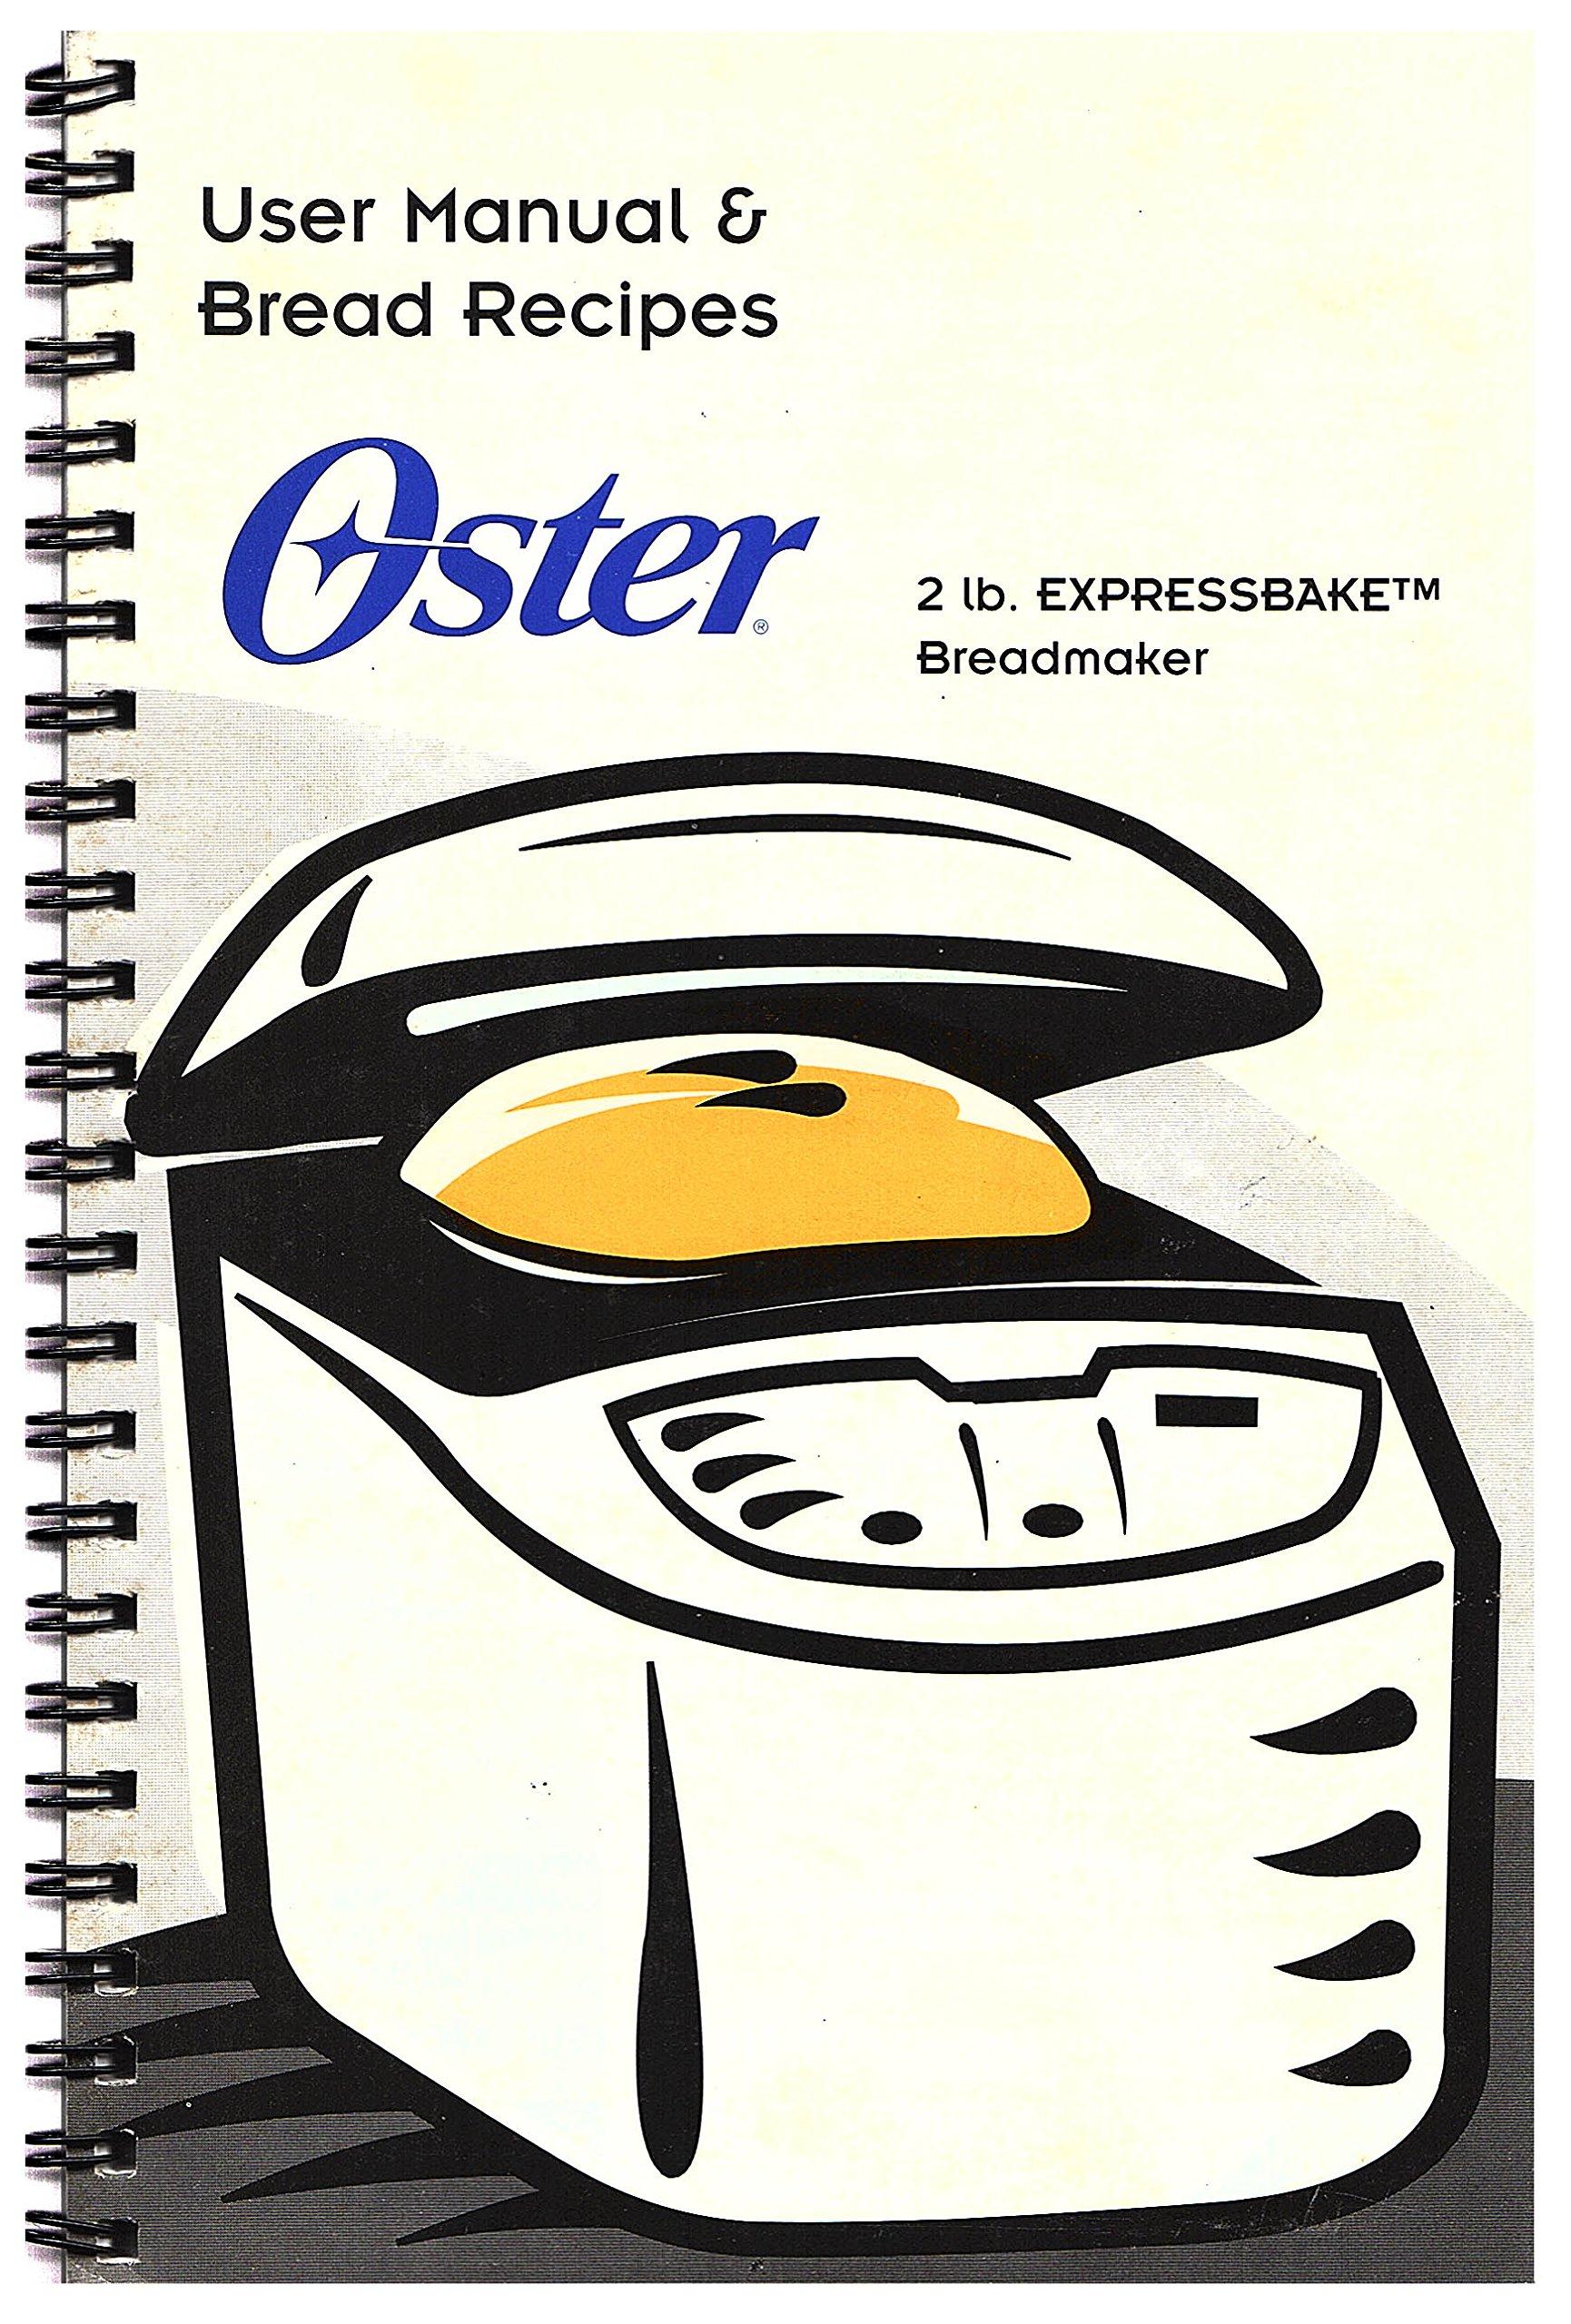 oster 2 lb expressbake breadmaker user manual bread recipes rh amazon com oster bread machine manual 5839 /5840 oster bread machine manual 5836